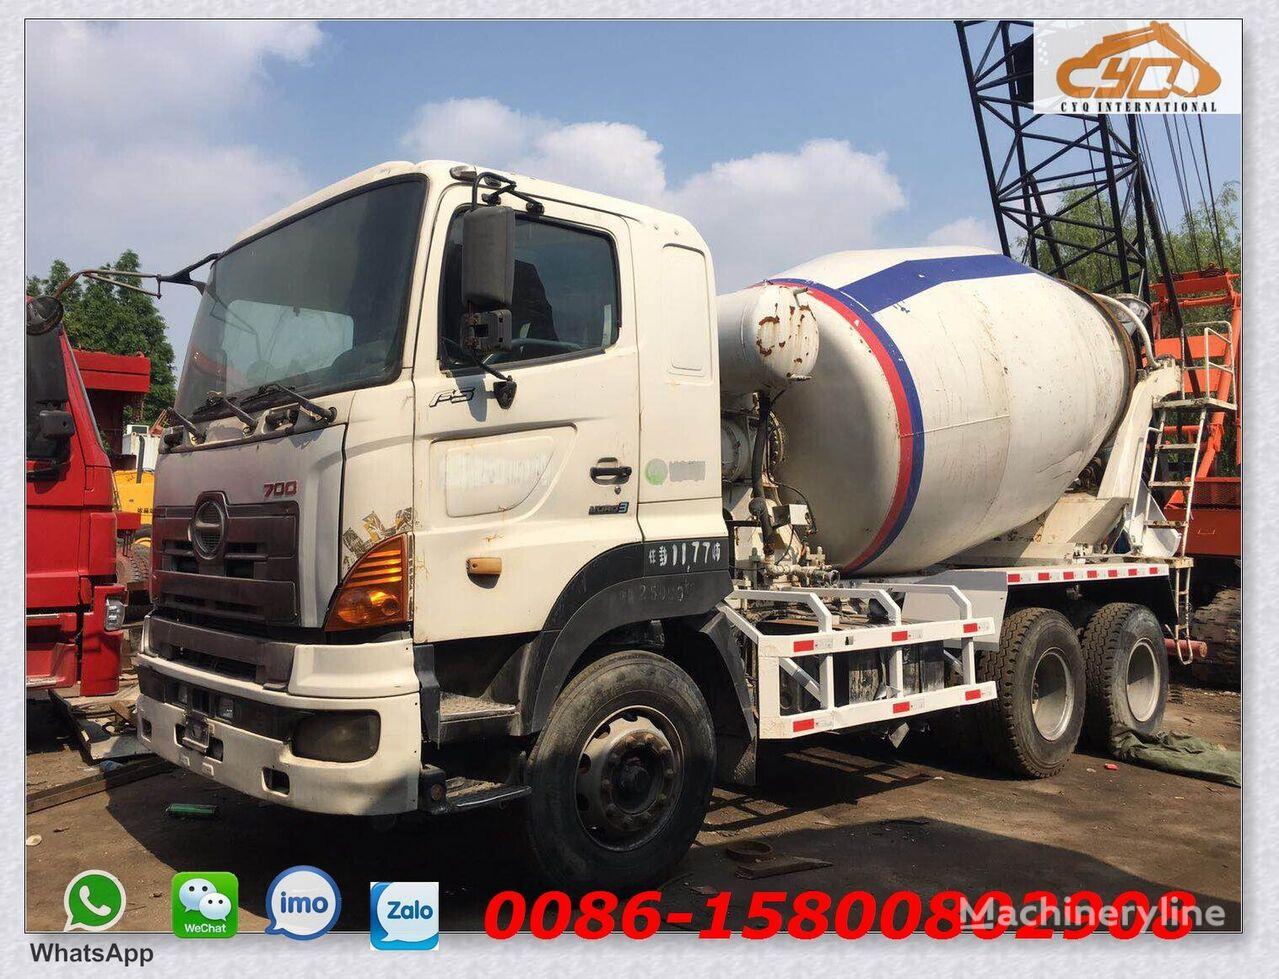 HINO 700 kamion s mješalicom za beton